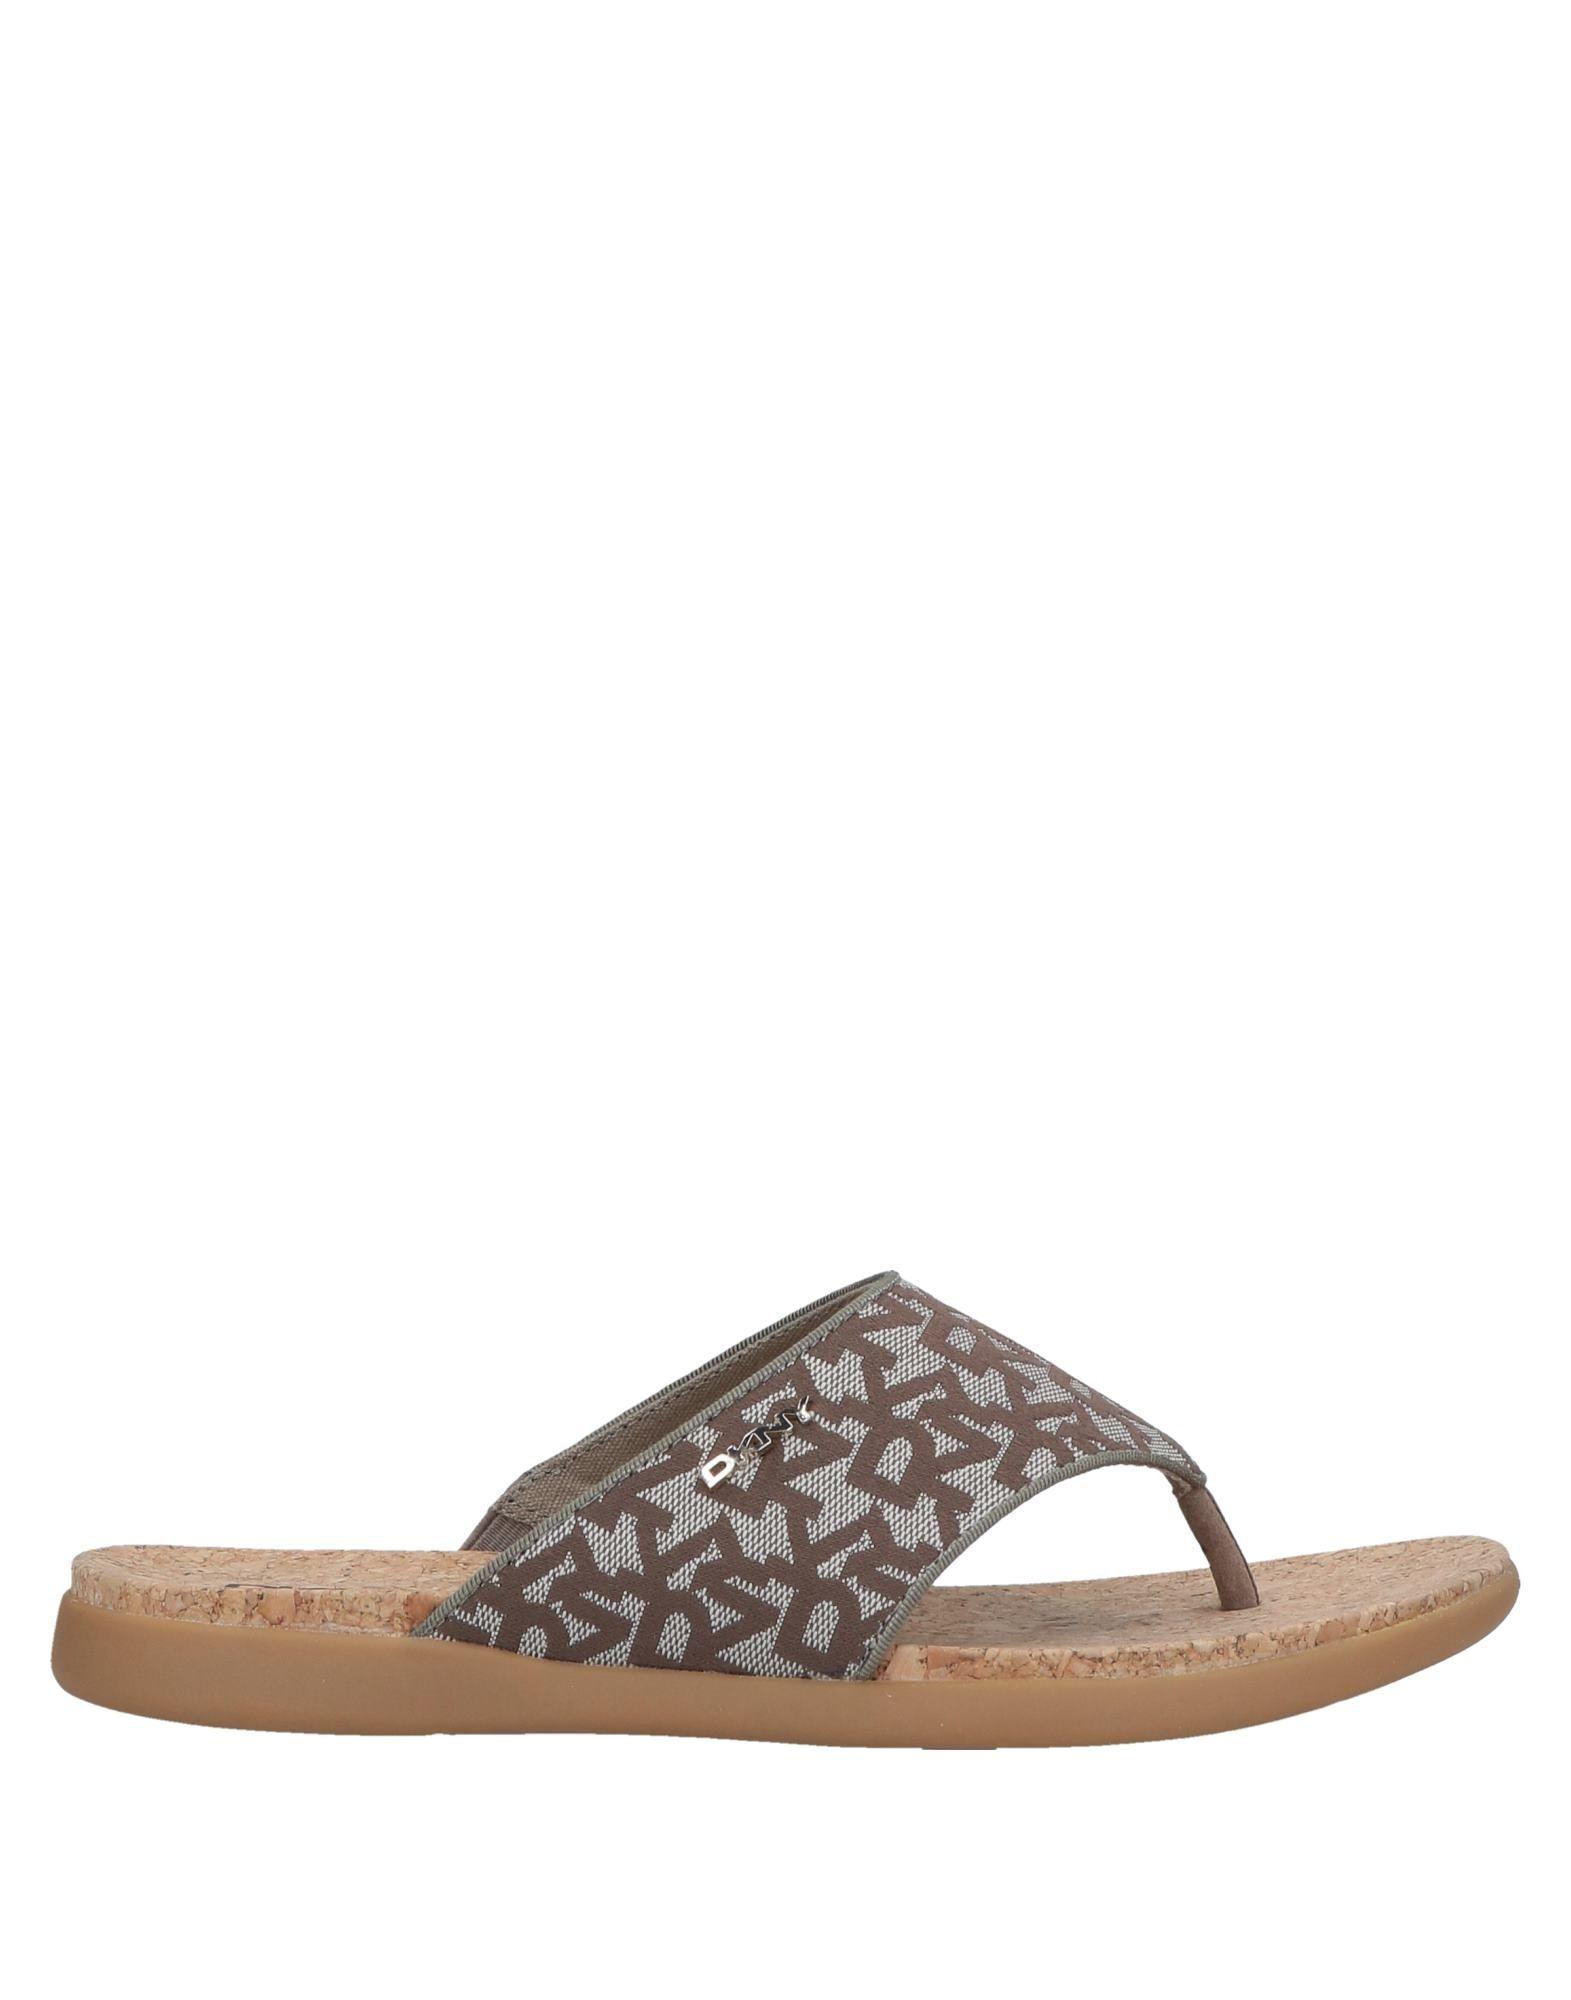 c8182093b2b Lyst - DKNY Toe Strap Sandal in Natural